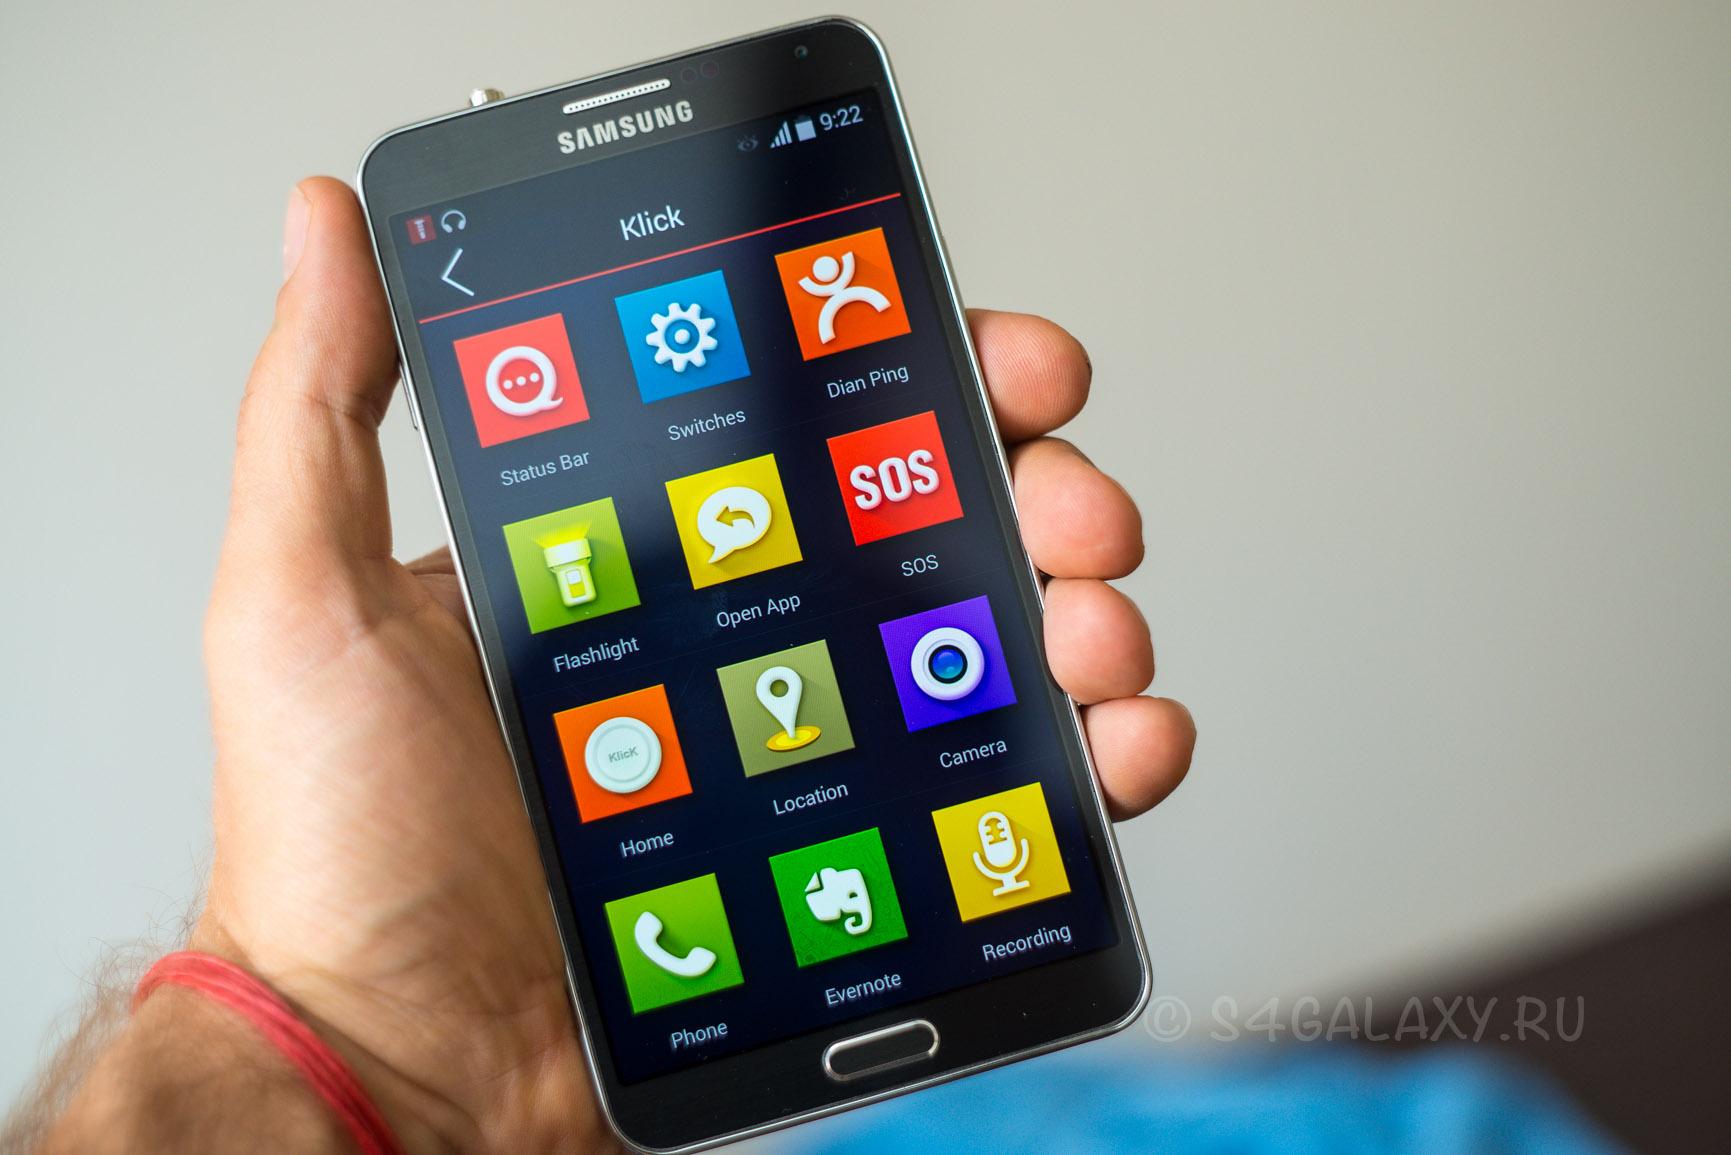 Let's Klick - кнопка-ярлык для Samsung Galaxy Note 3